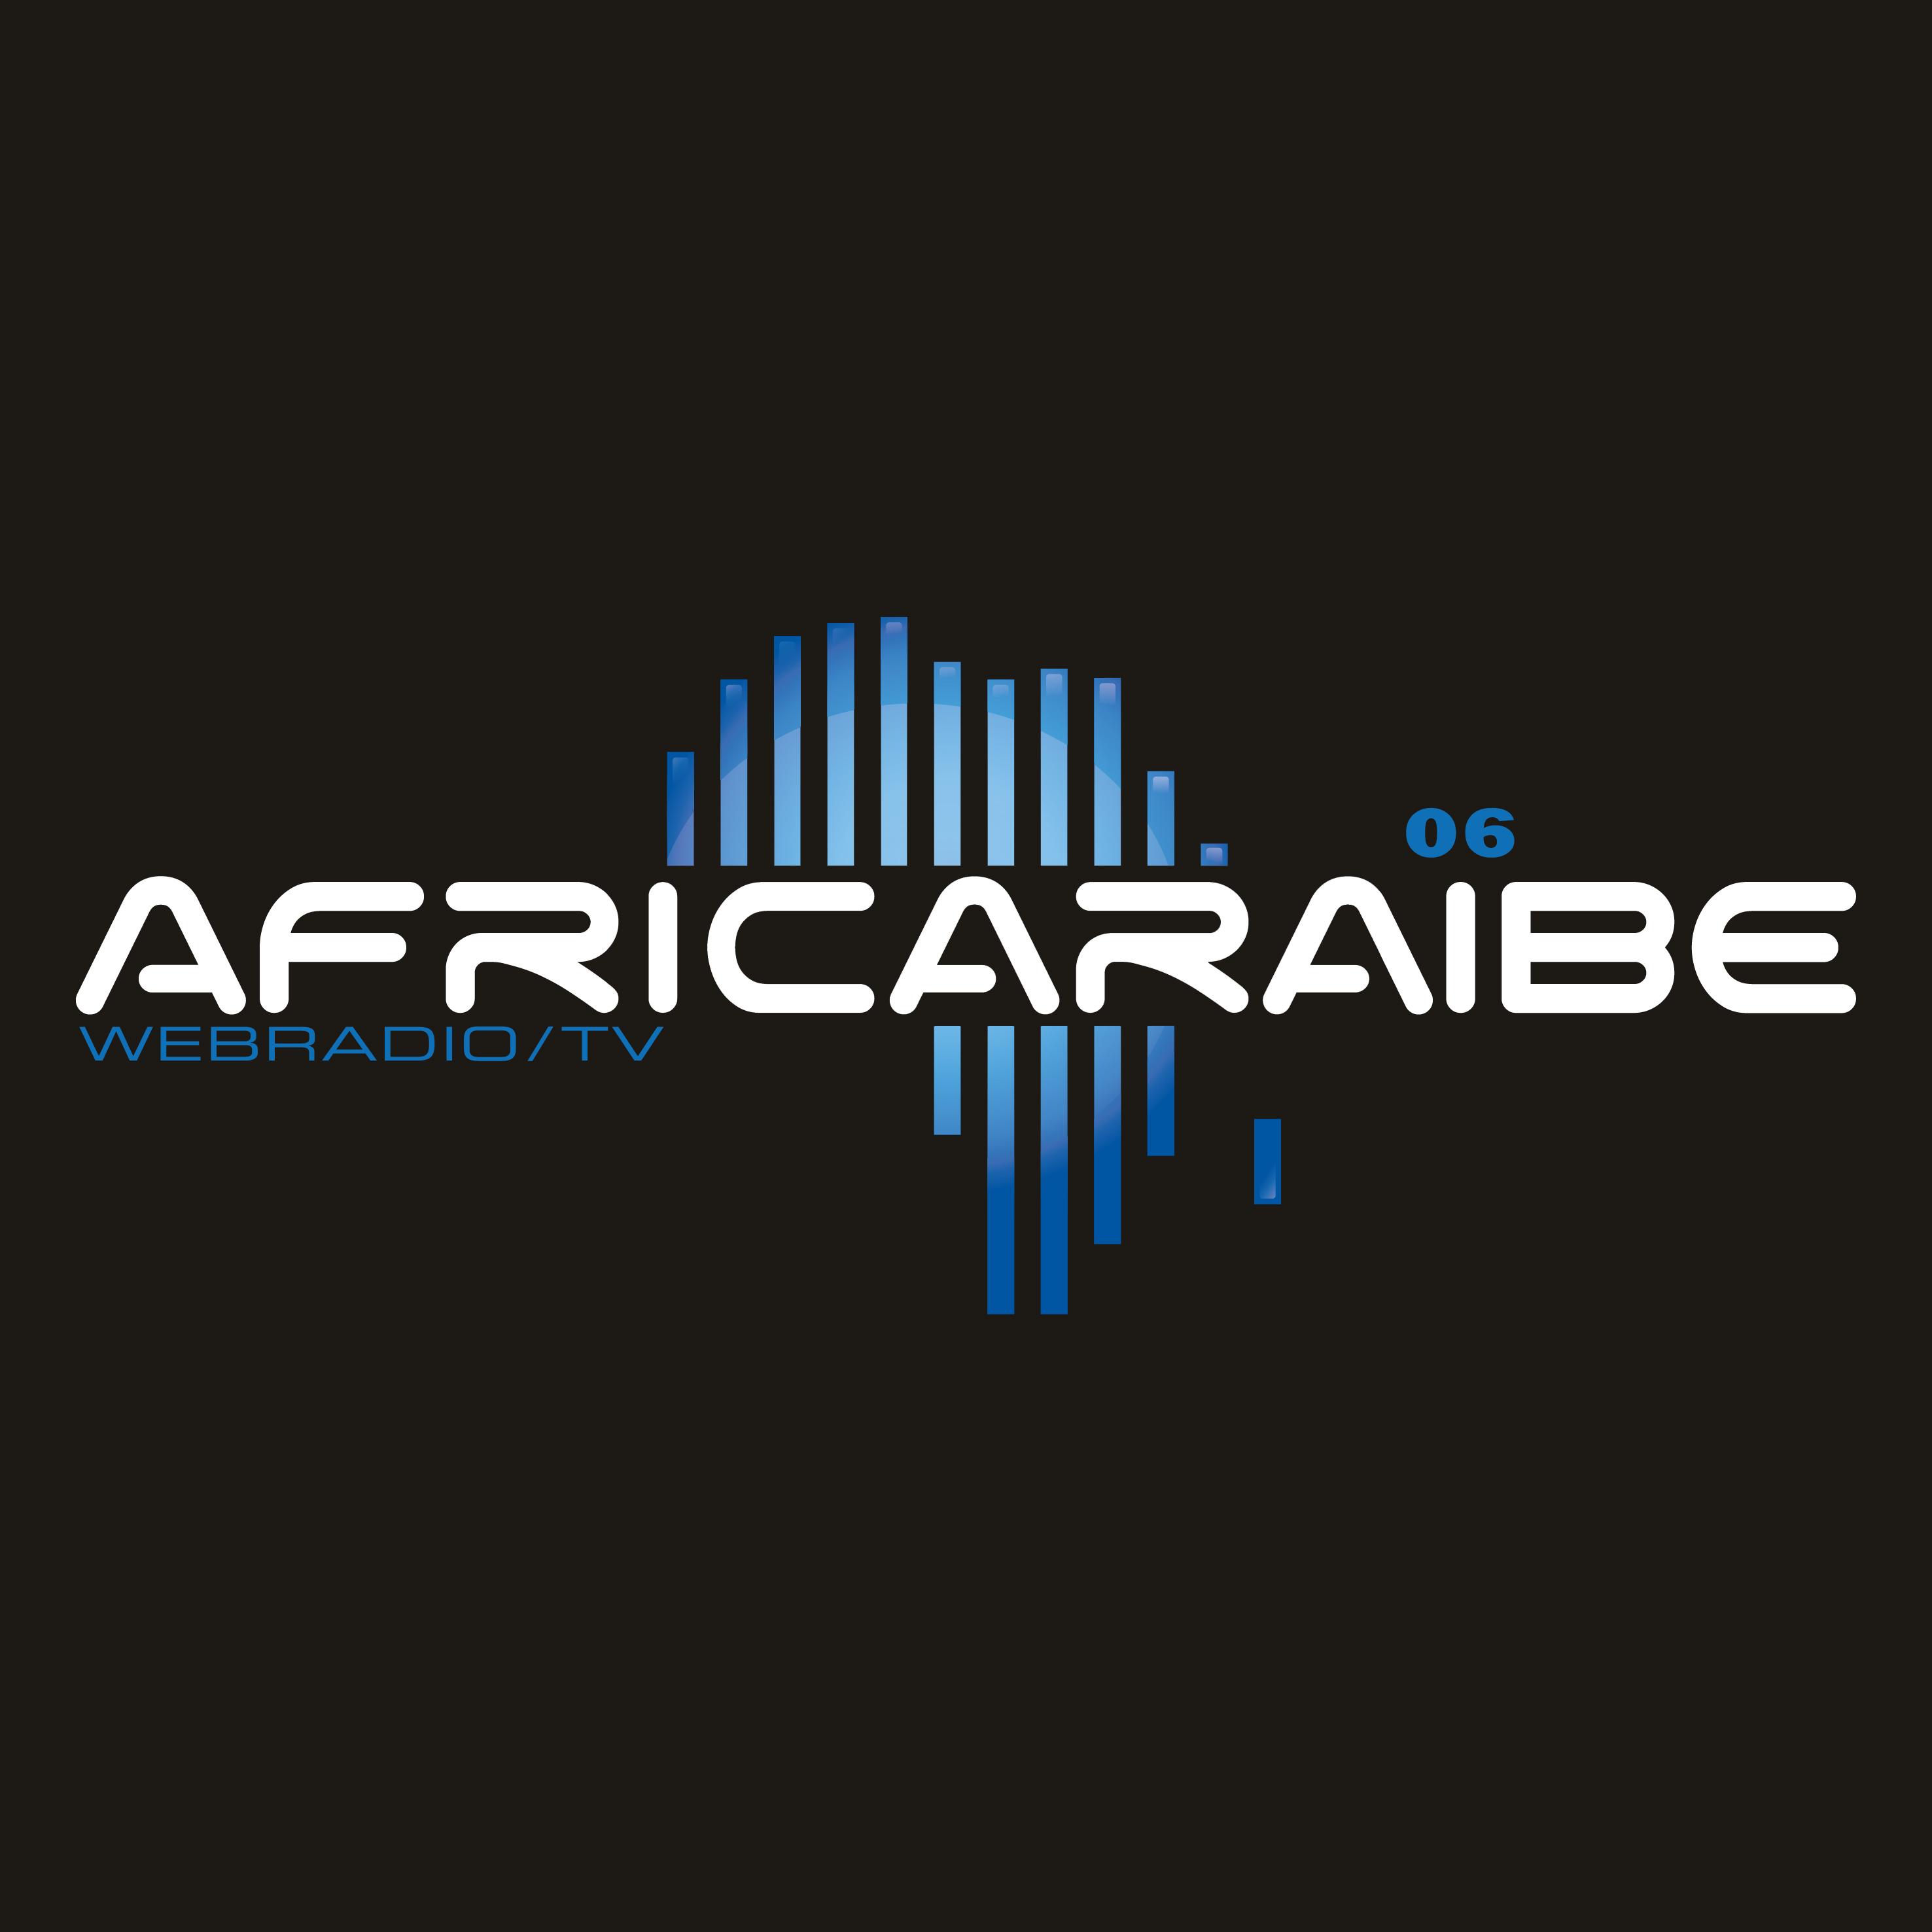 Africaraibe 06